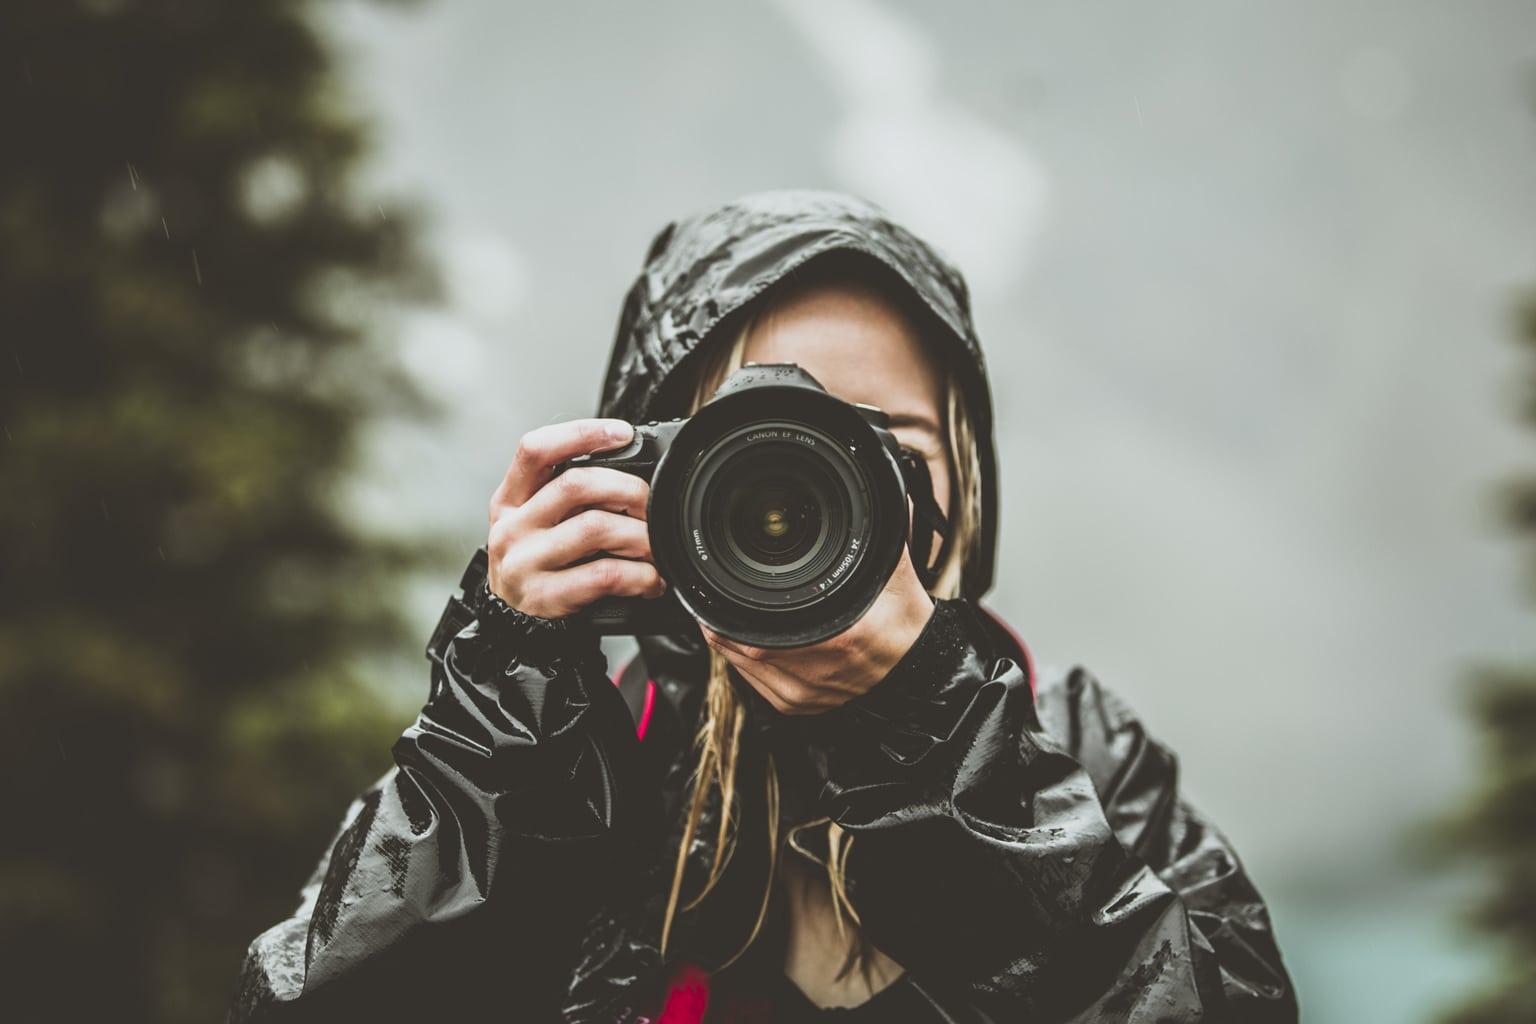 women-taking-photos-in-the-rain